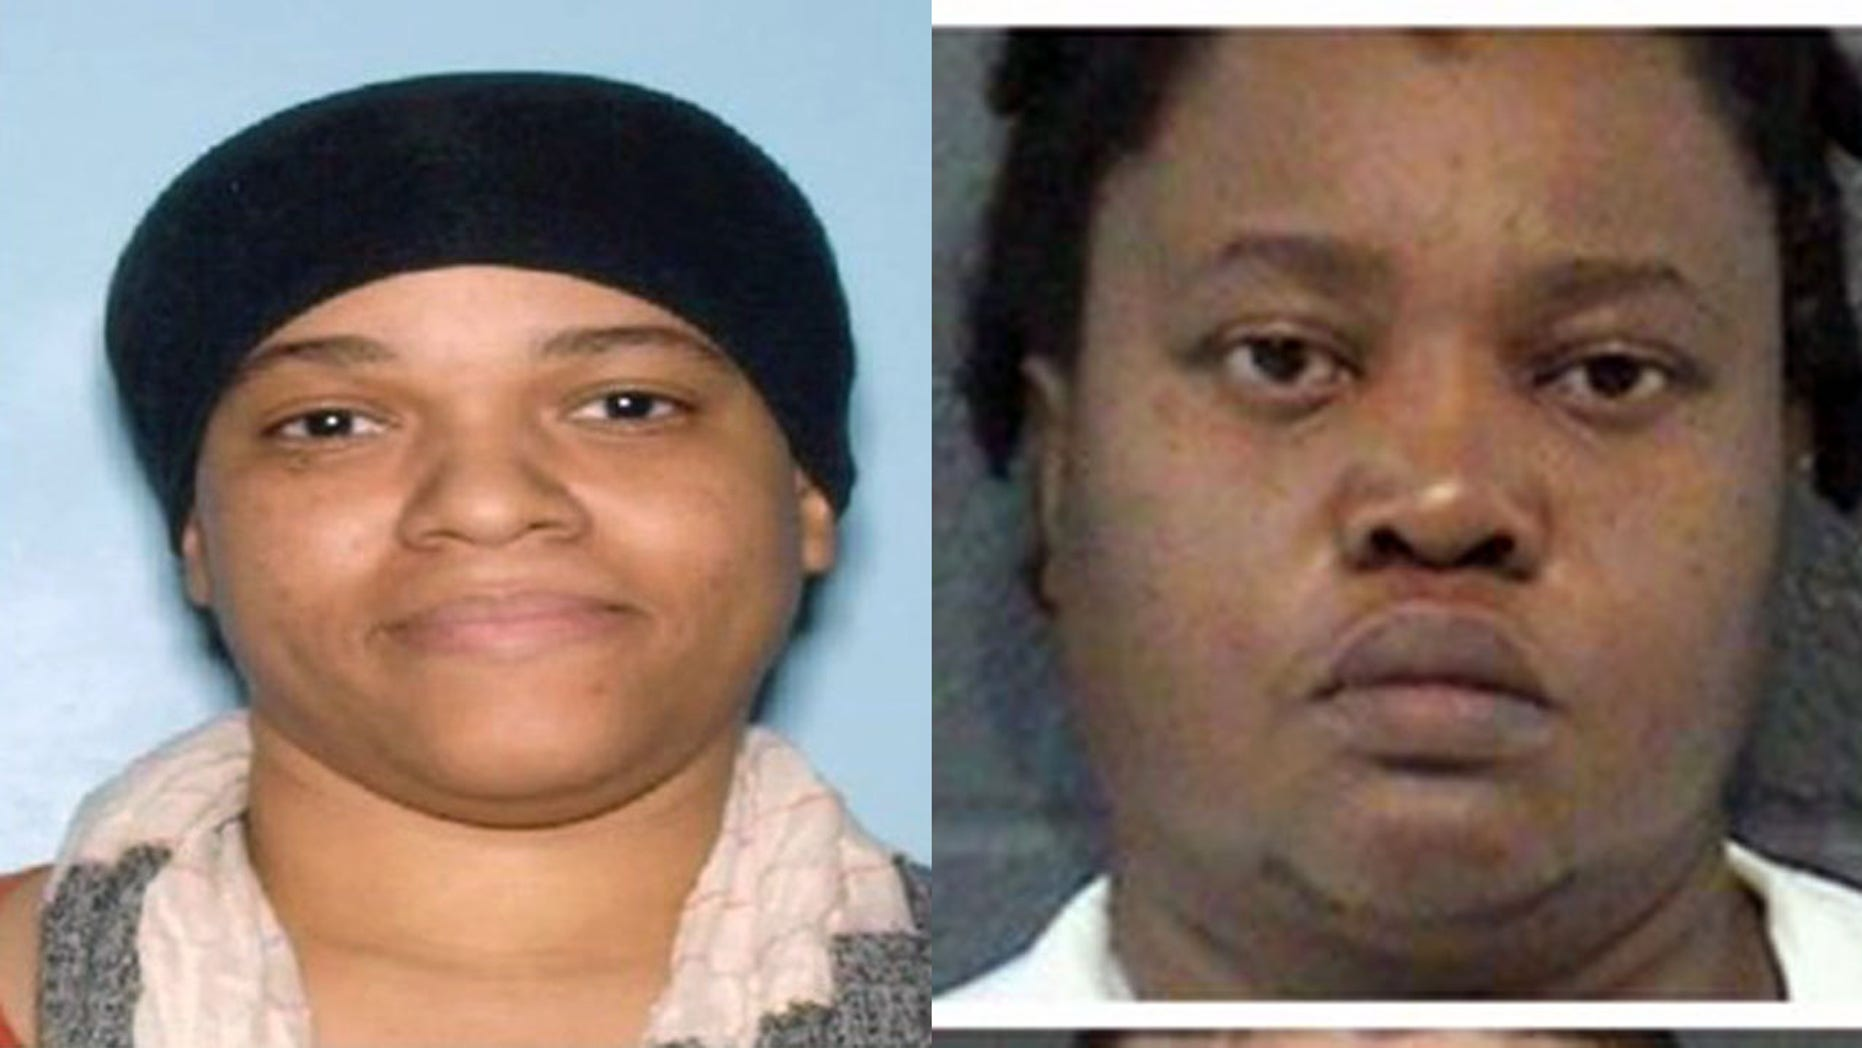 Nashika Bramble, left, and Madani Ceus were originally arrested last month on felony child abuse charges